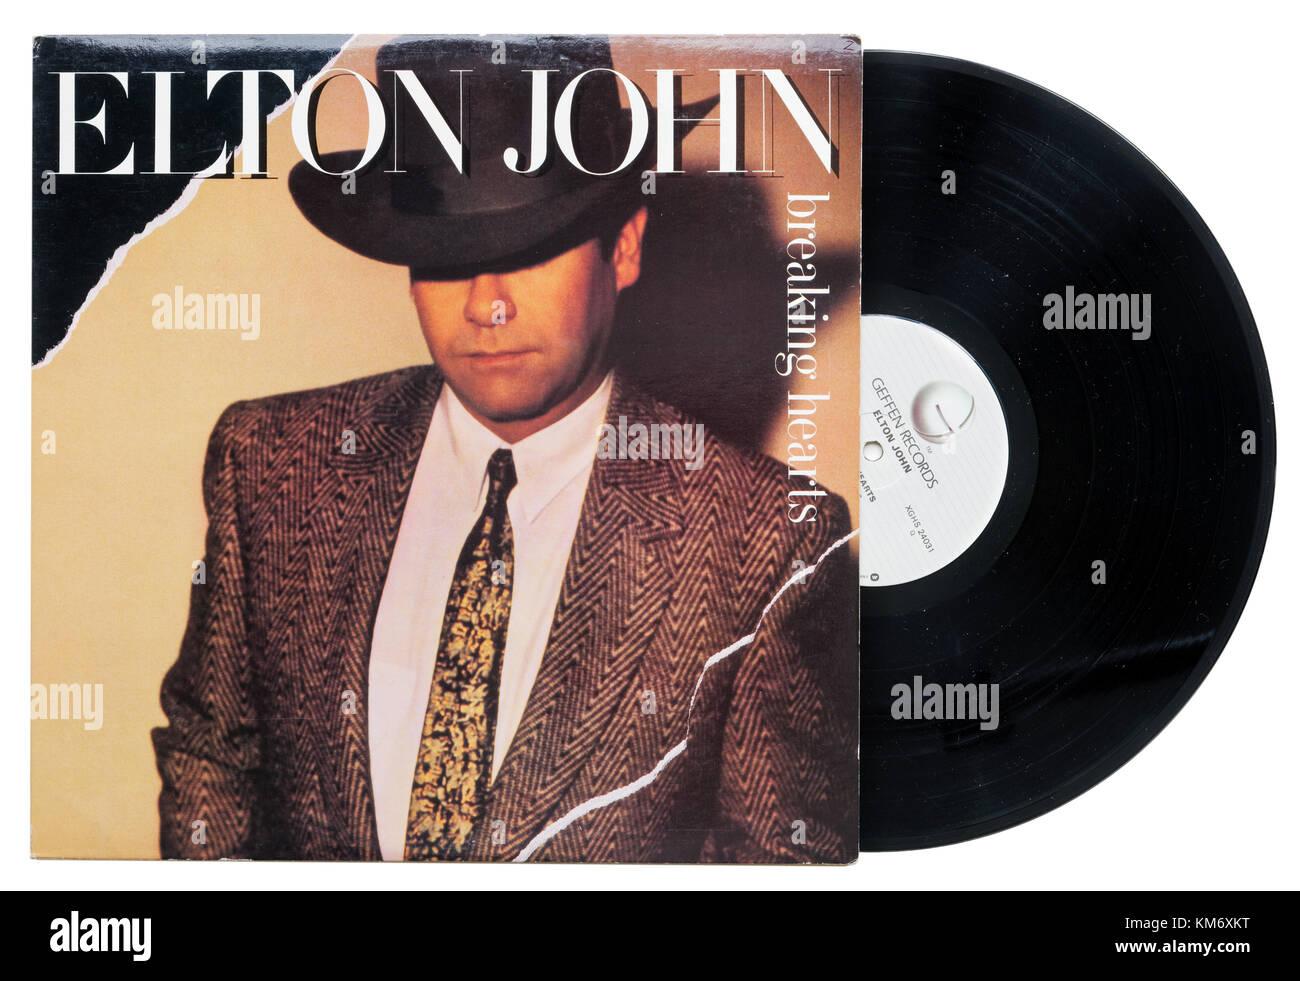 Elton John album Breaking Hearts Photo Stock